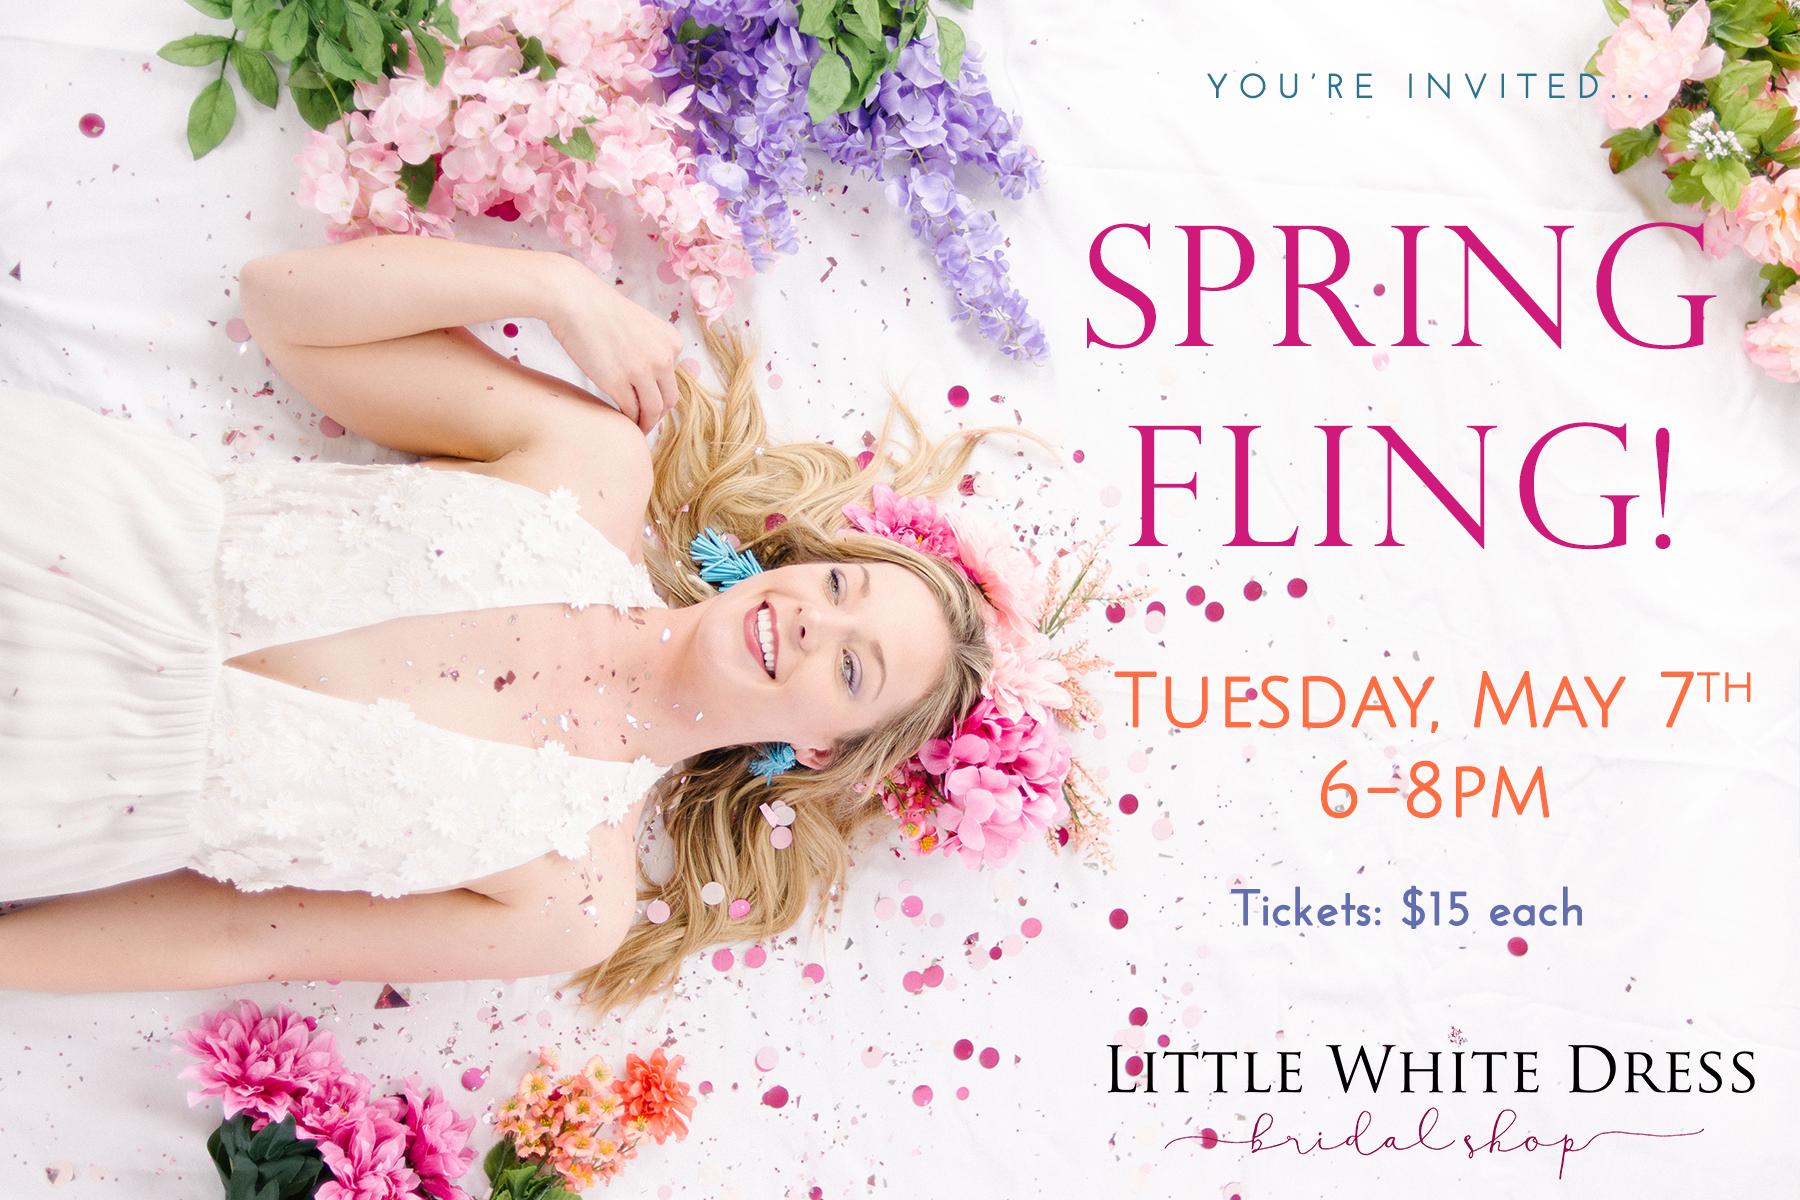 SpringFlinginvite.png